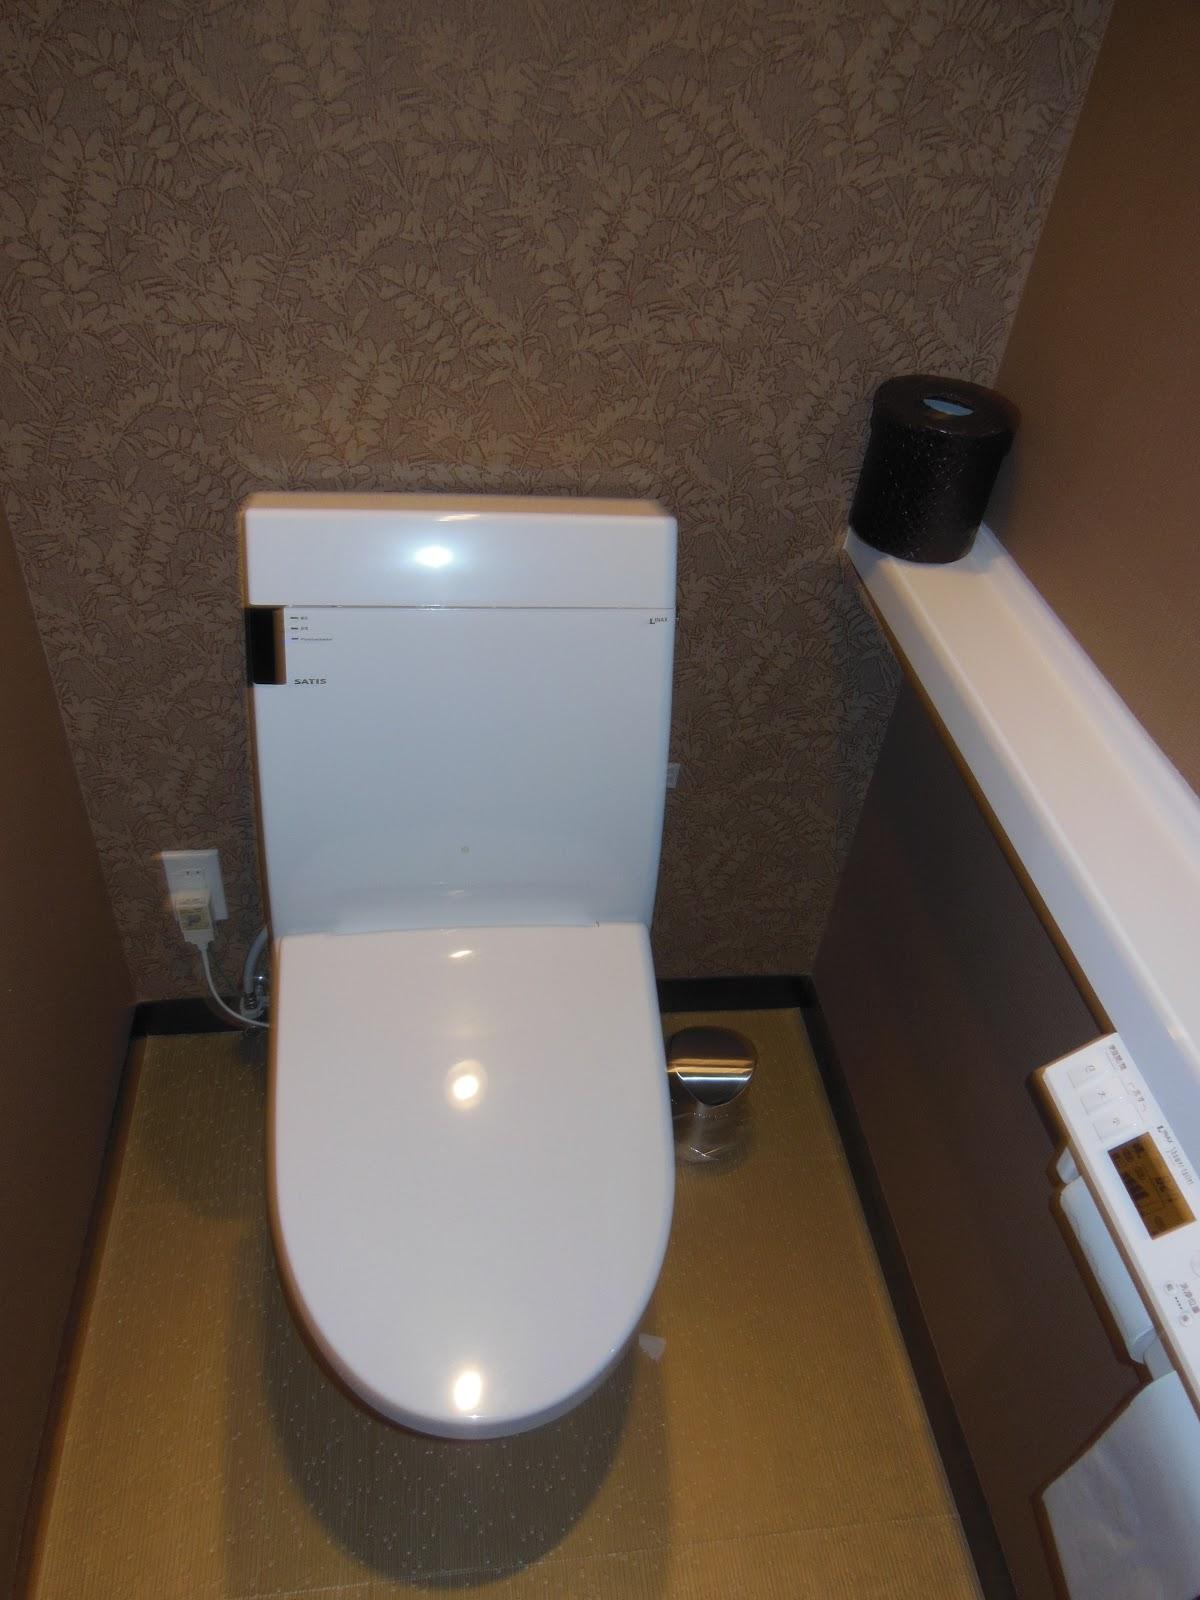 Commander Kelly: Japanese Toilets